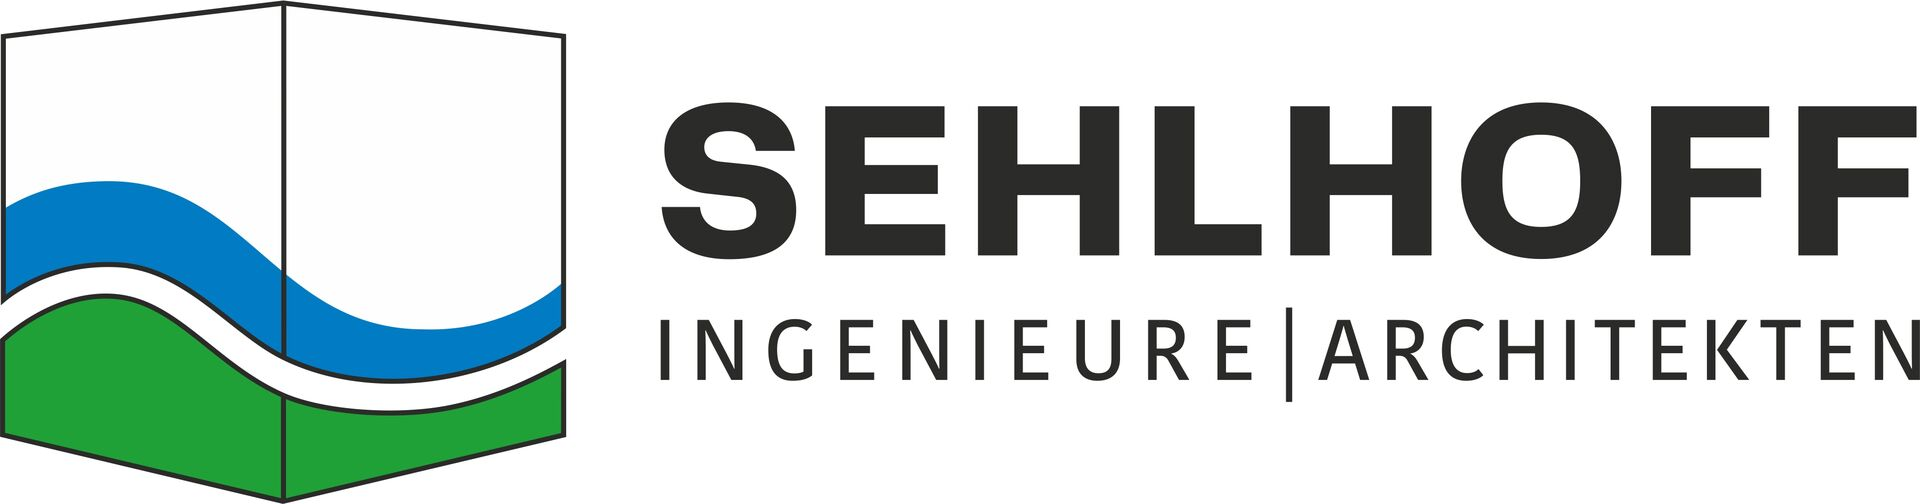 Logo_SEHLHOFF